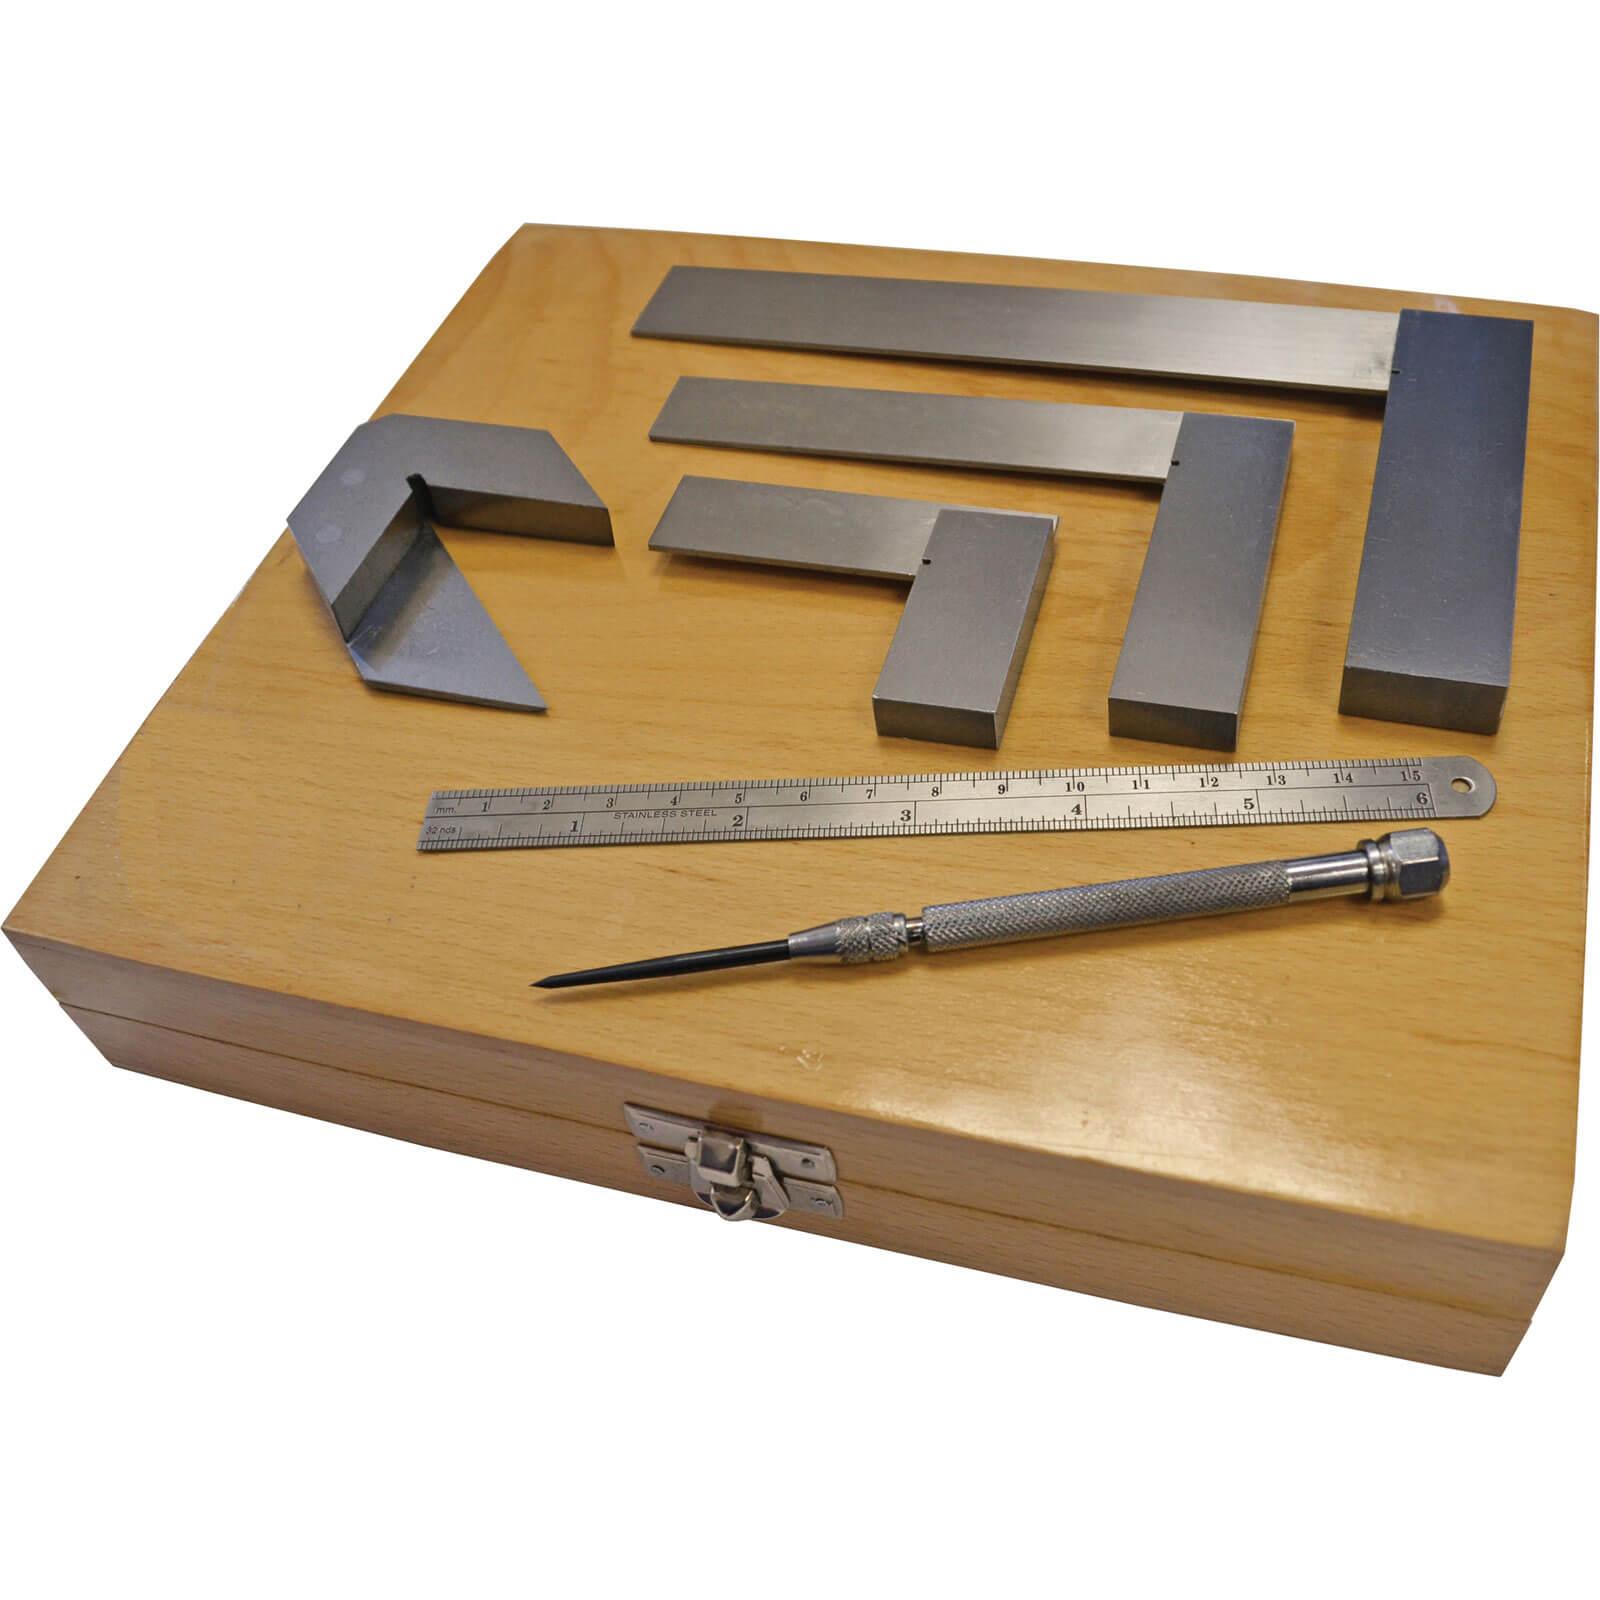 Image of Faithfull 6 Piece Engineers Marking & Measuring Set